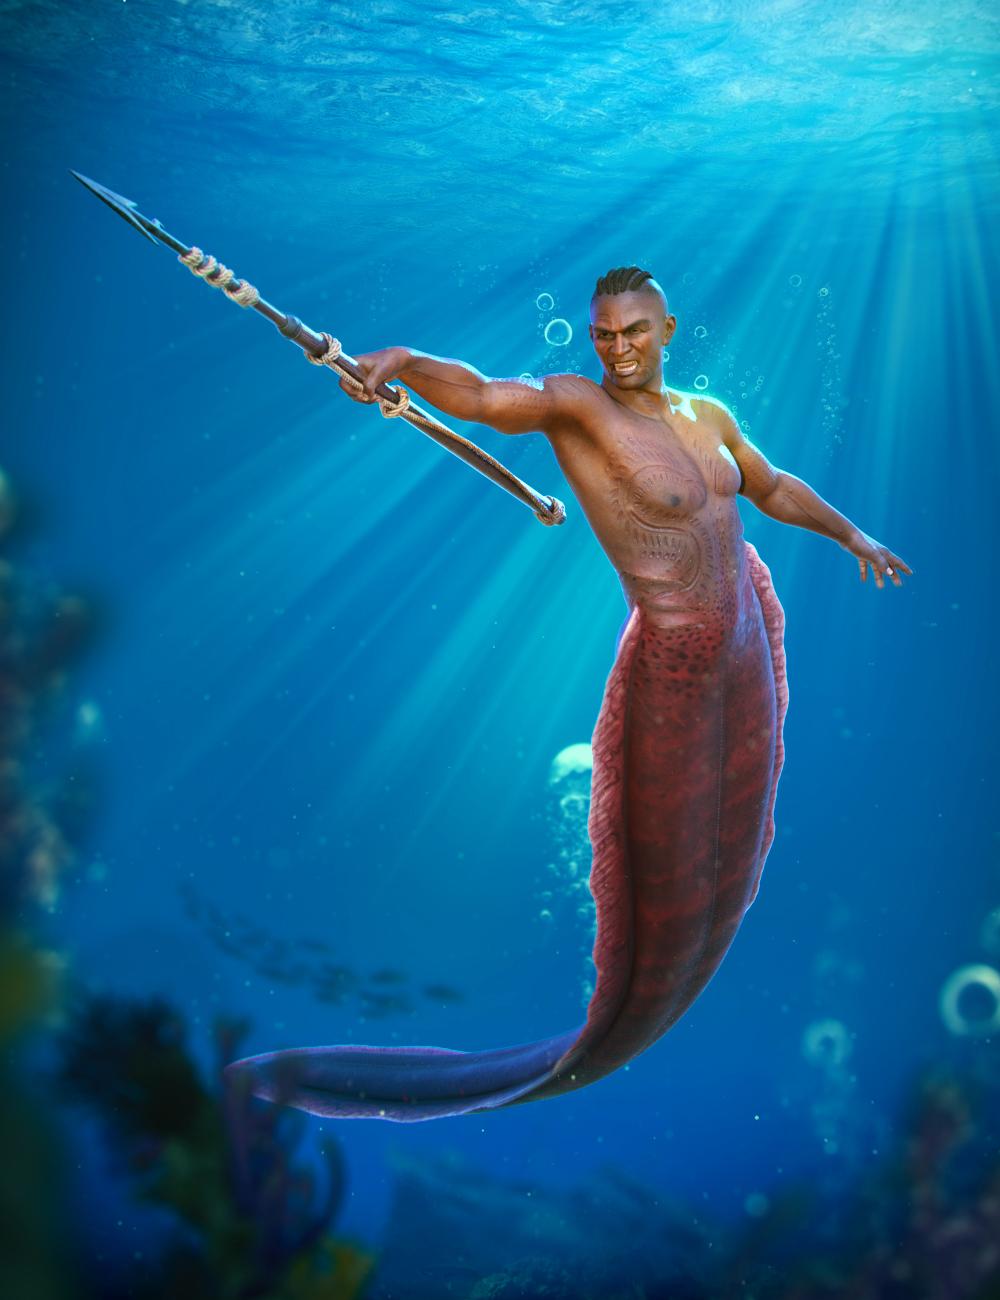 Mermaid Animations for Zale 8.1 by: ThreeDigital, 3D Models by Daz 3D